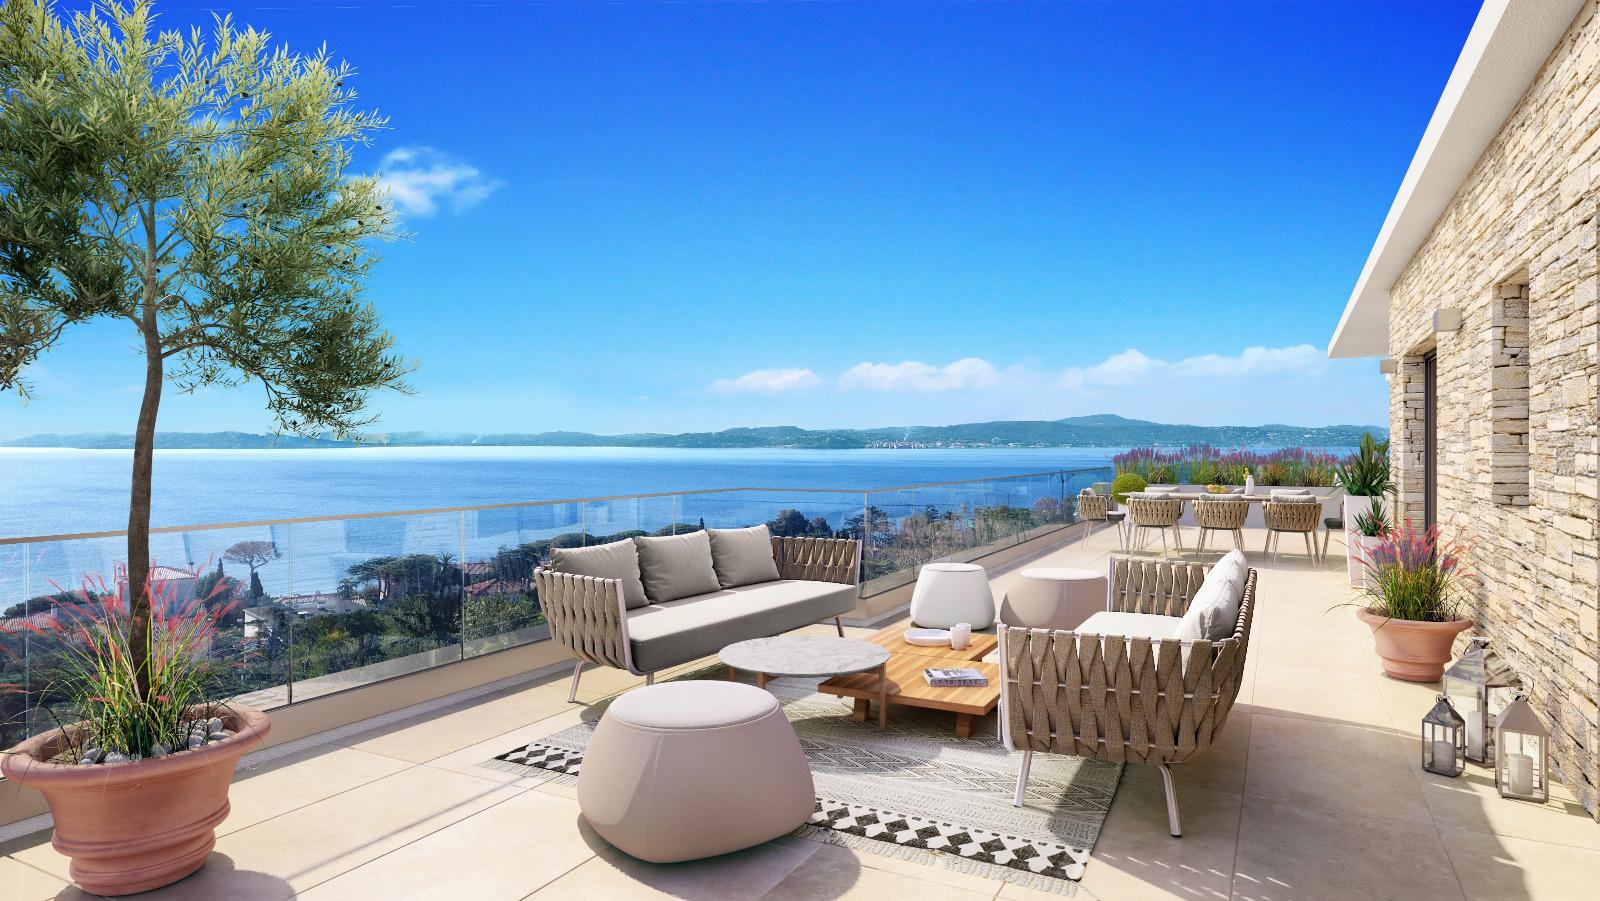 Vema invest immobilier golfe st tropez vente achat for Vue sur terrasse